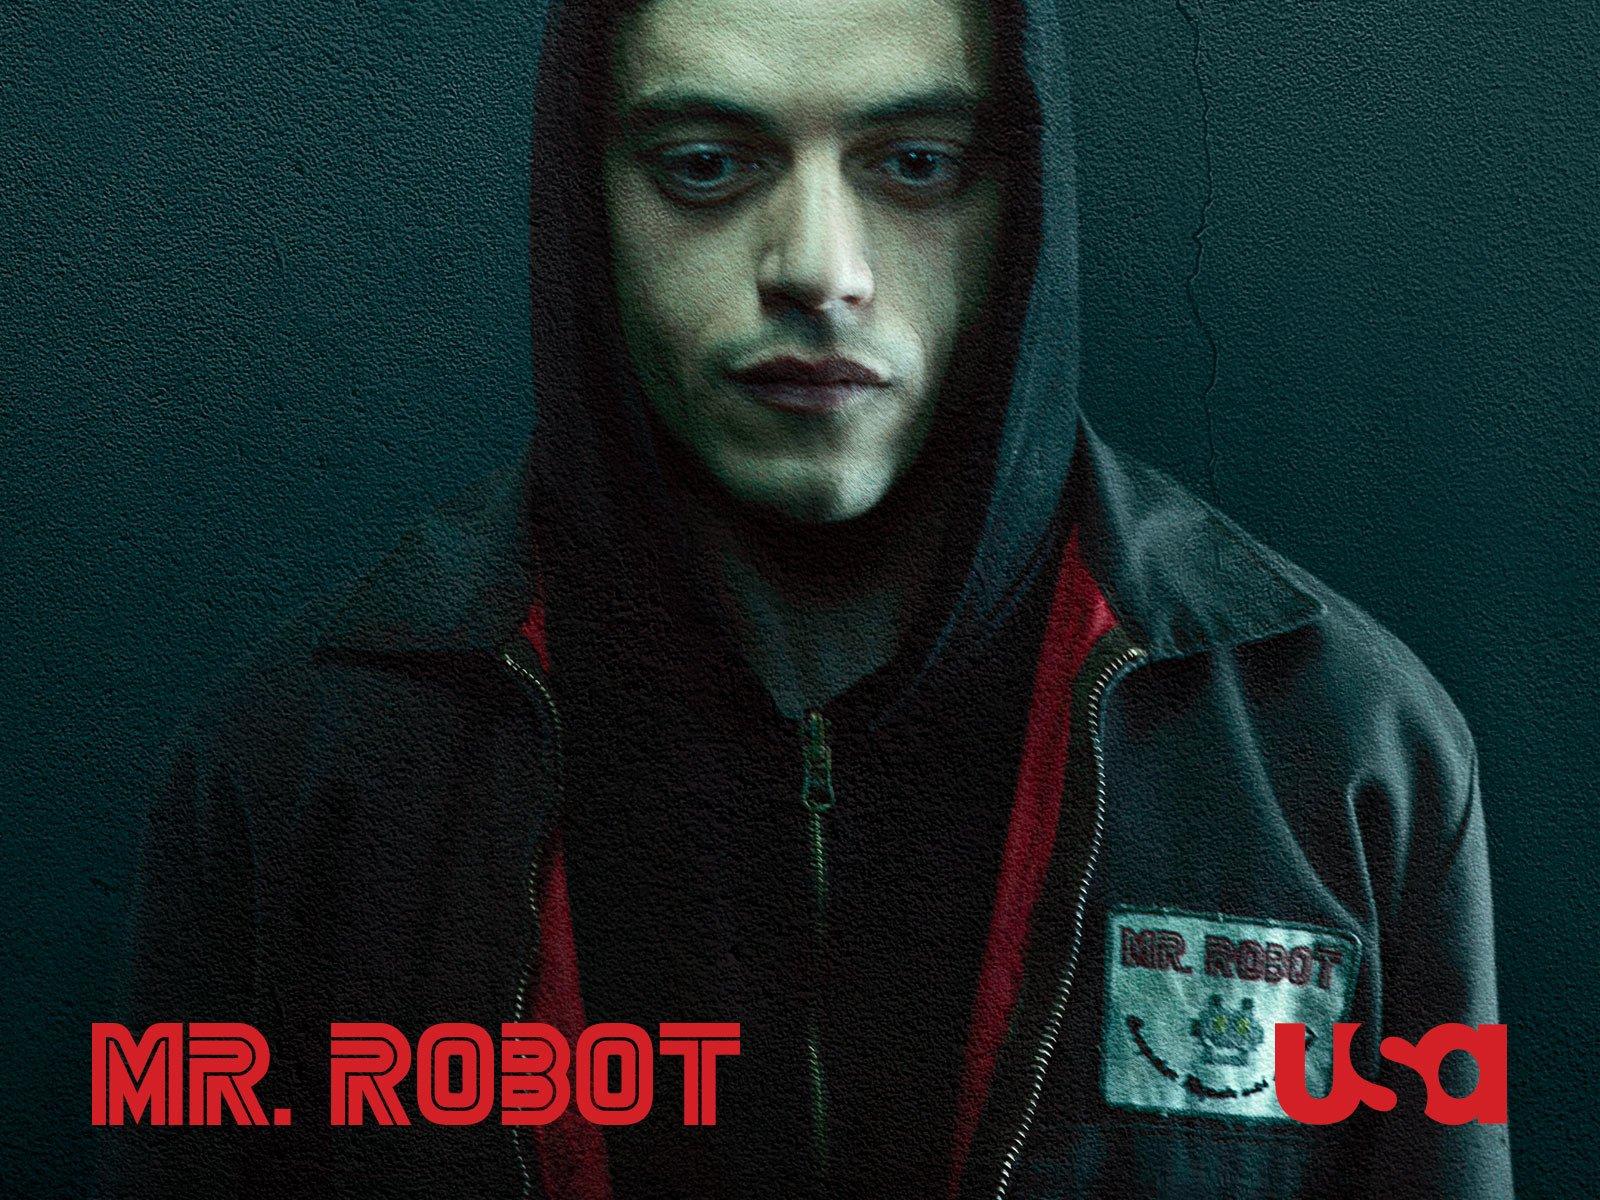 Mr Robot Season 2 Download Mkv - rhjy.ipersfocati.it